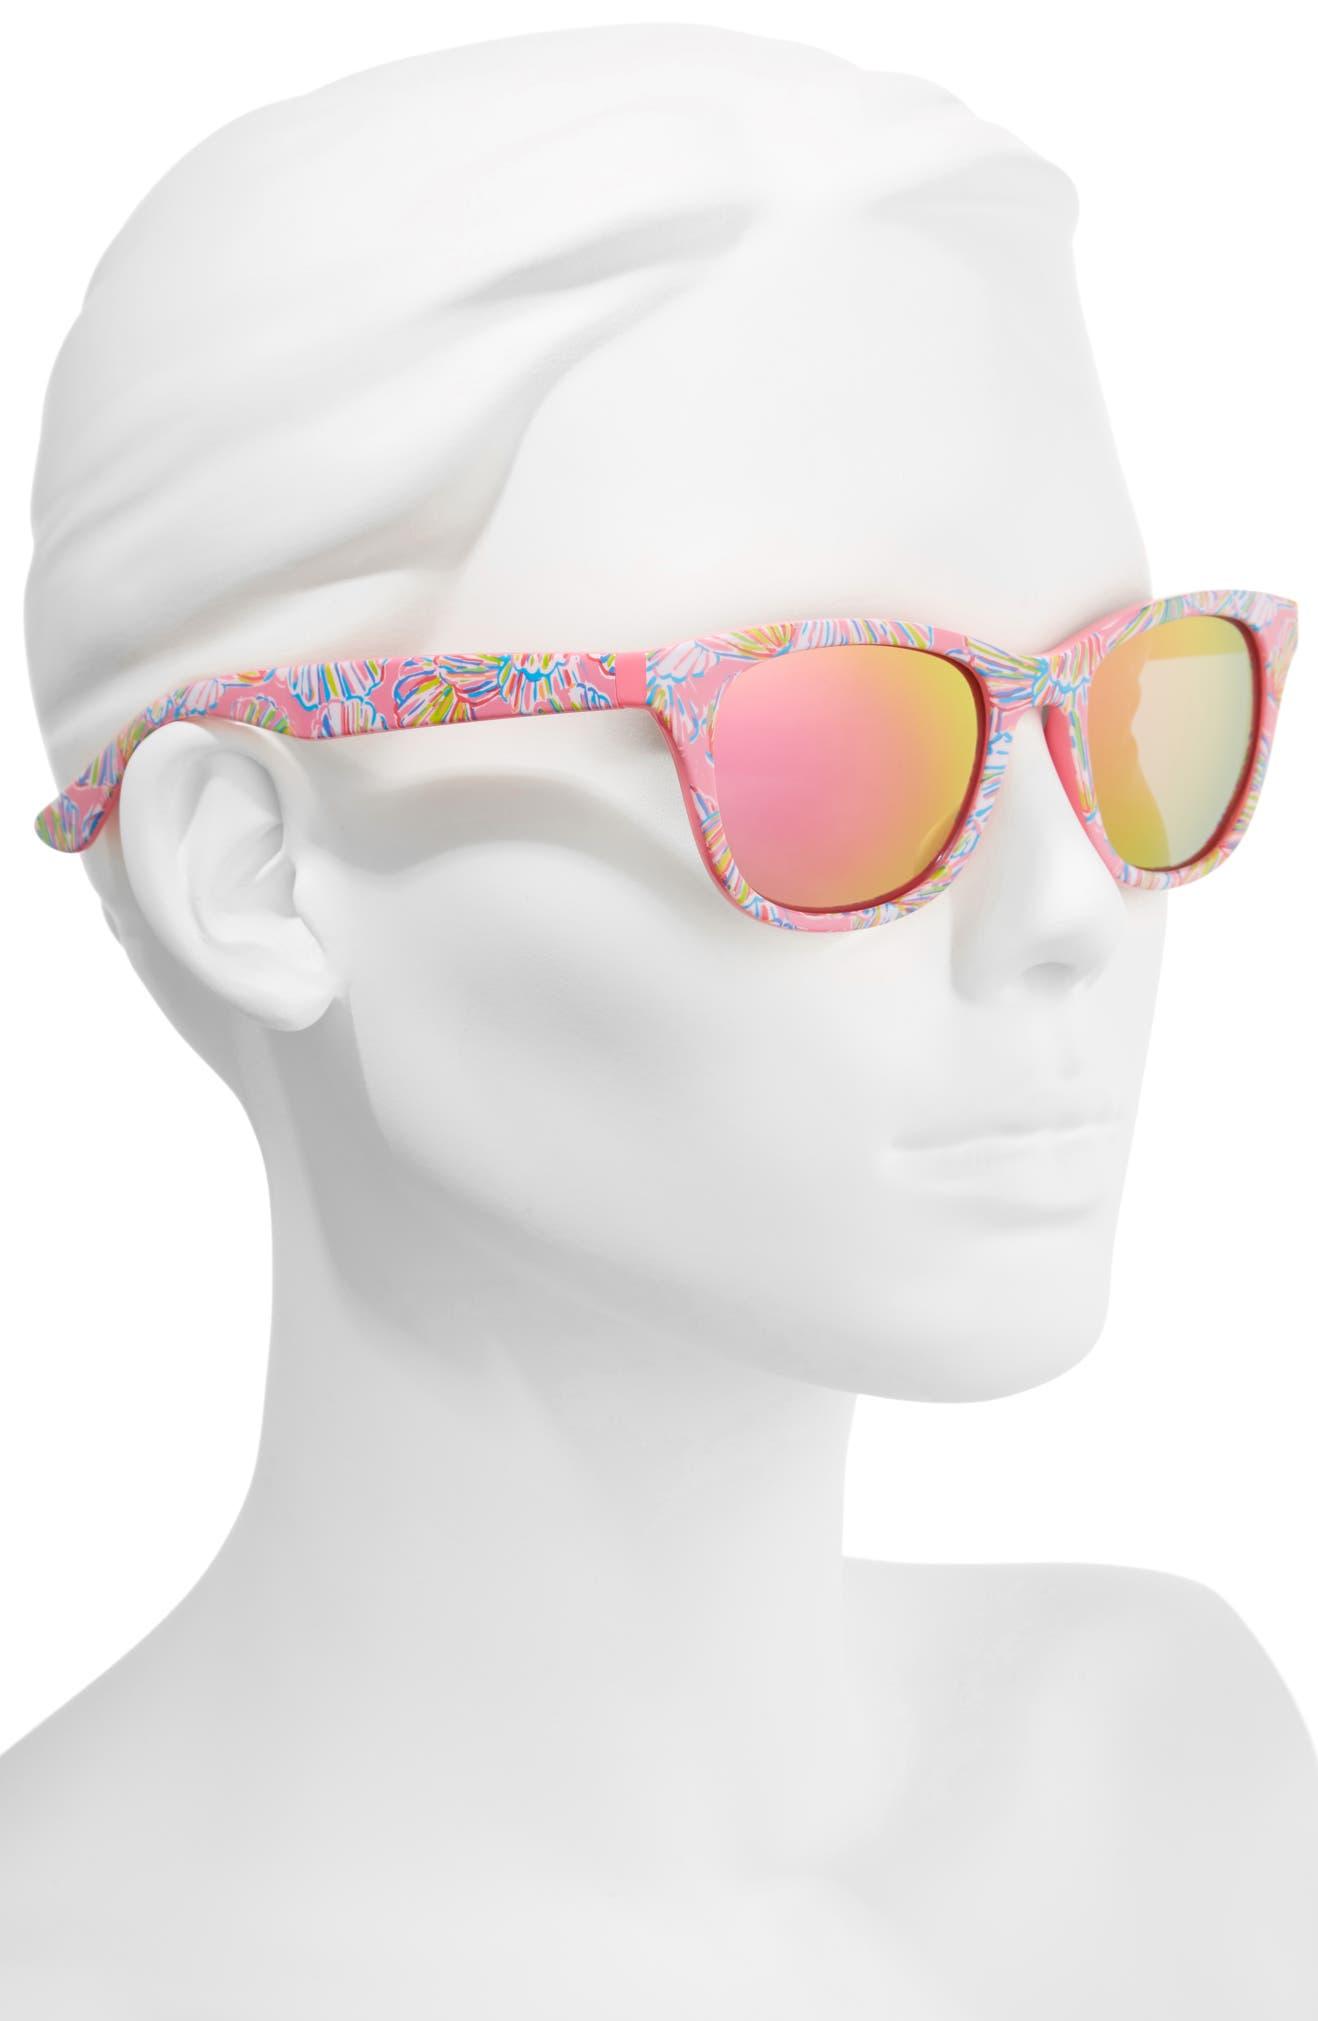 63ce5493e9 Lilly Pulitzer® Maddie 52mm Polarized Mirrored Sunglasses